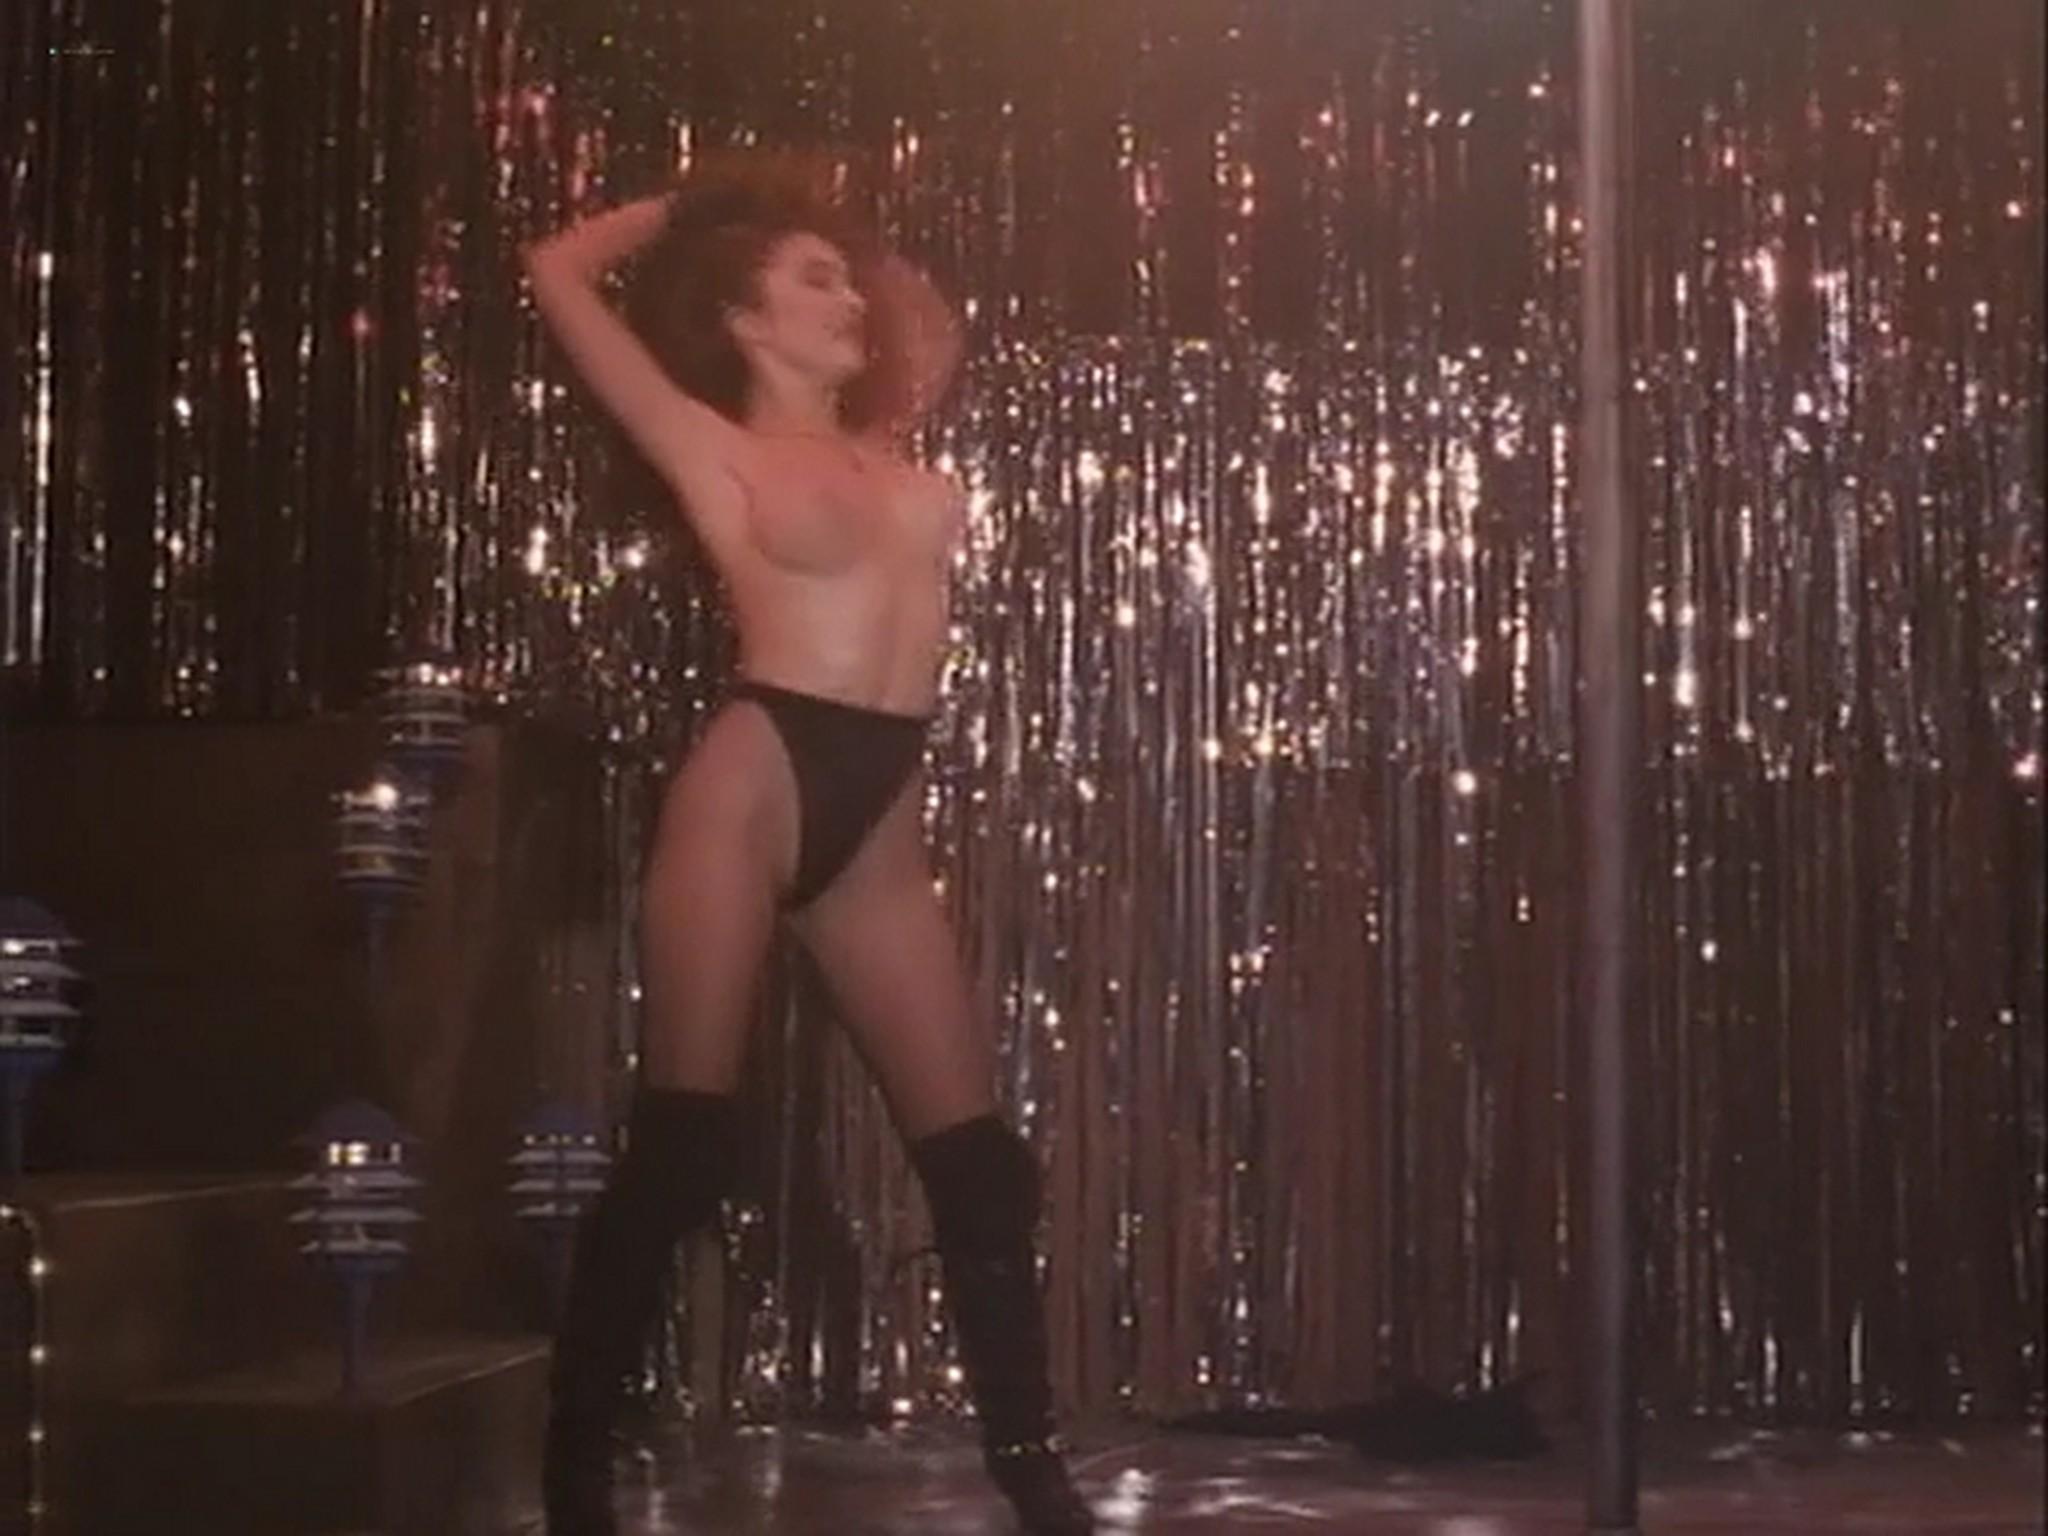 Barbara Alyn Woods nude Catya Sassoon Jill Pierce nude too as strippers Dance with Death 1991 12